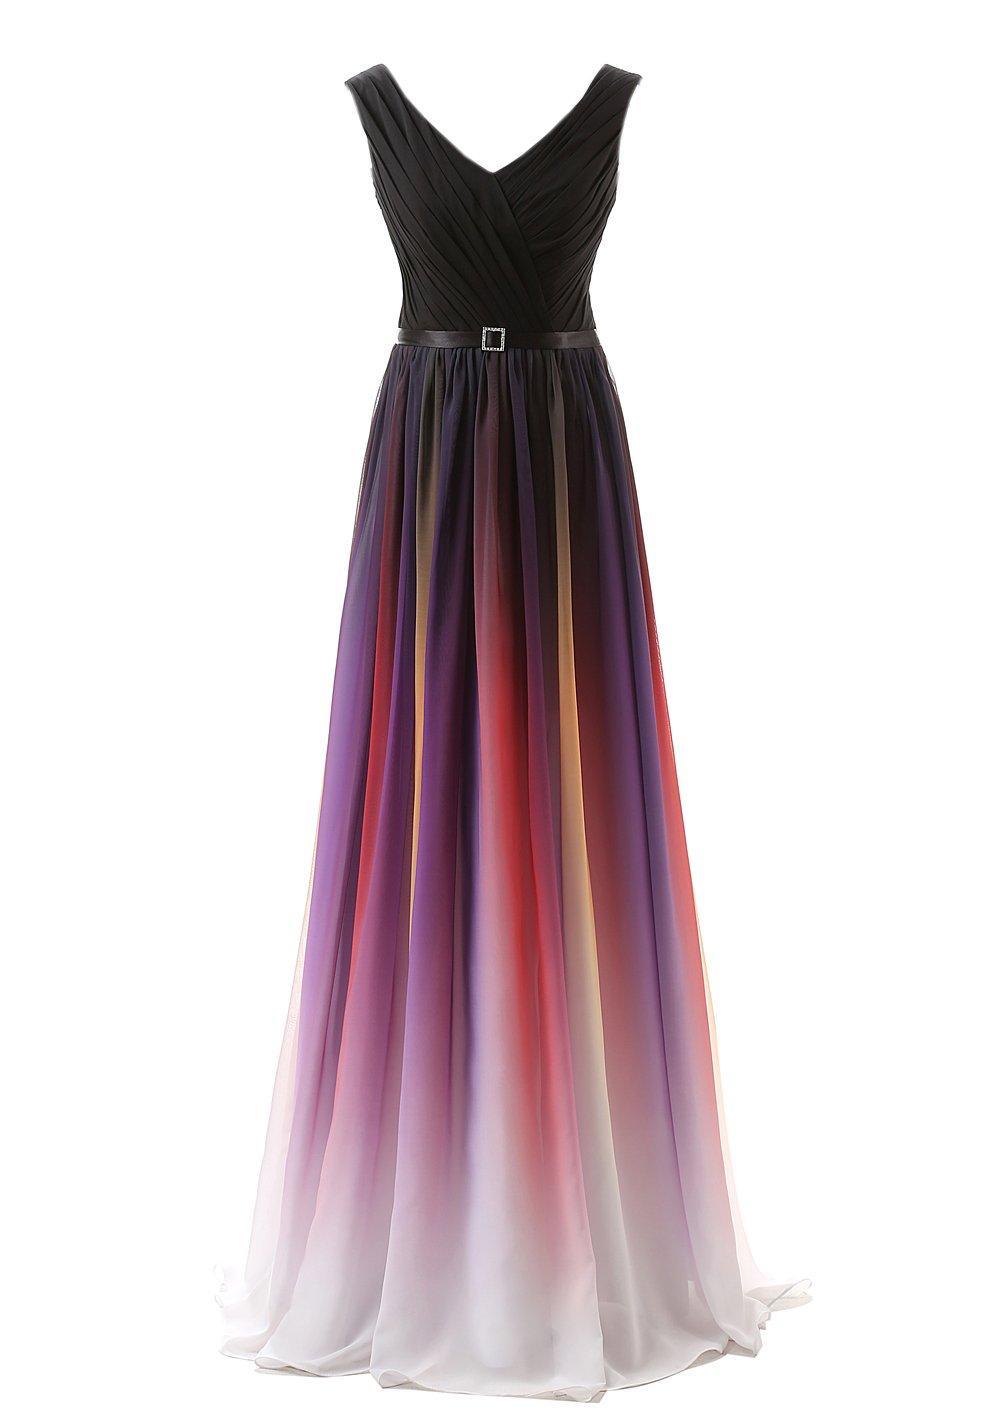 Belle House Women's Chiffon V Neck Gradient Color Prom Dresses 2018 Long A Line Formal Evening Dresses,341-black,8